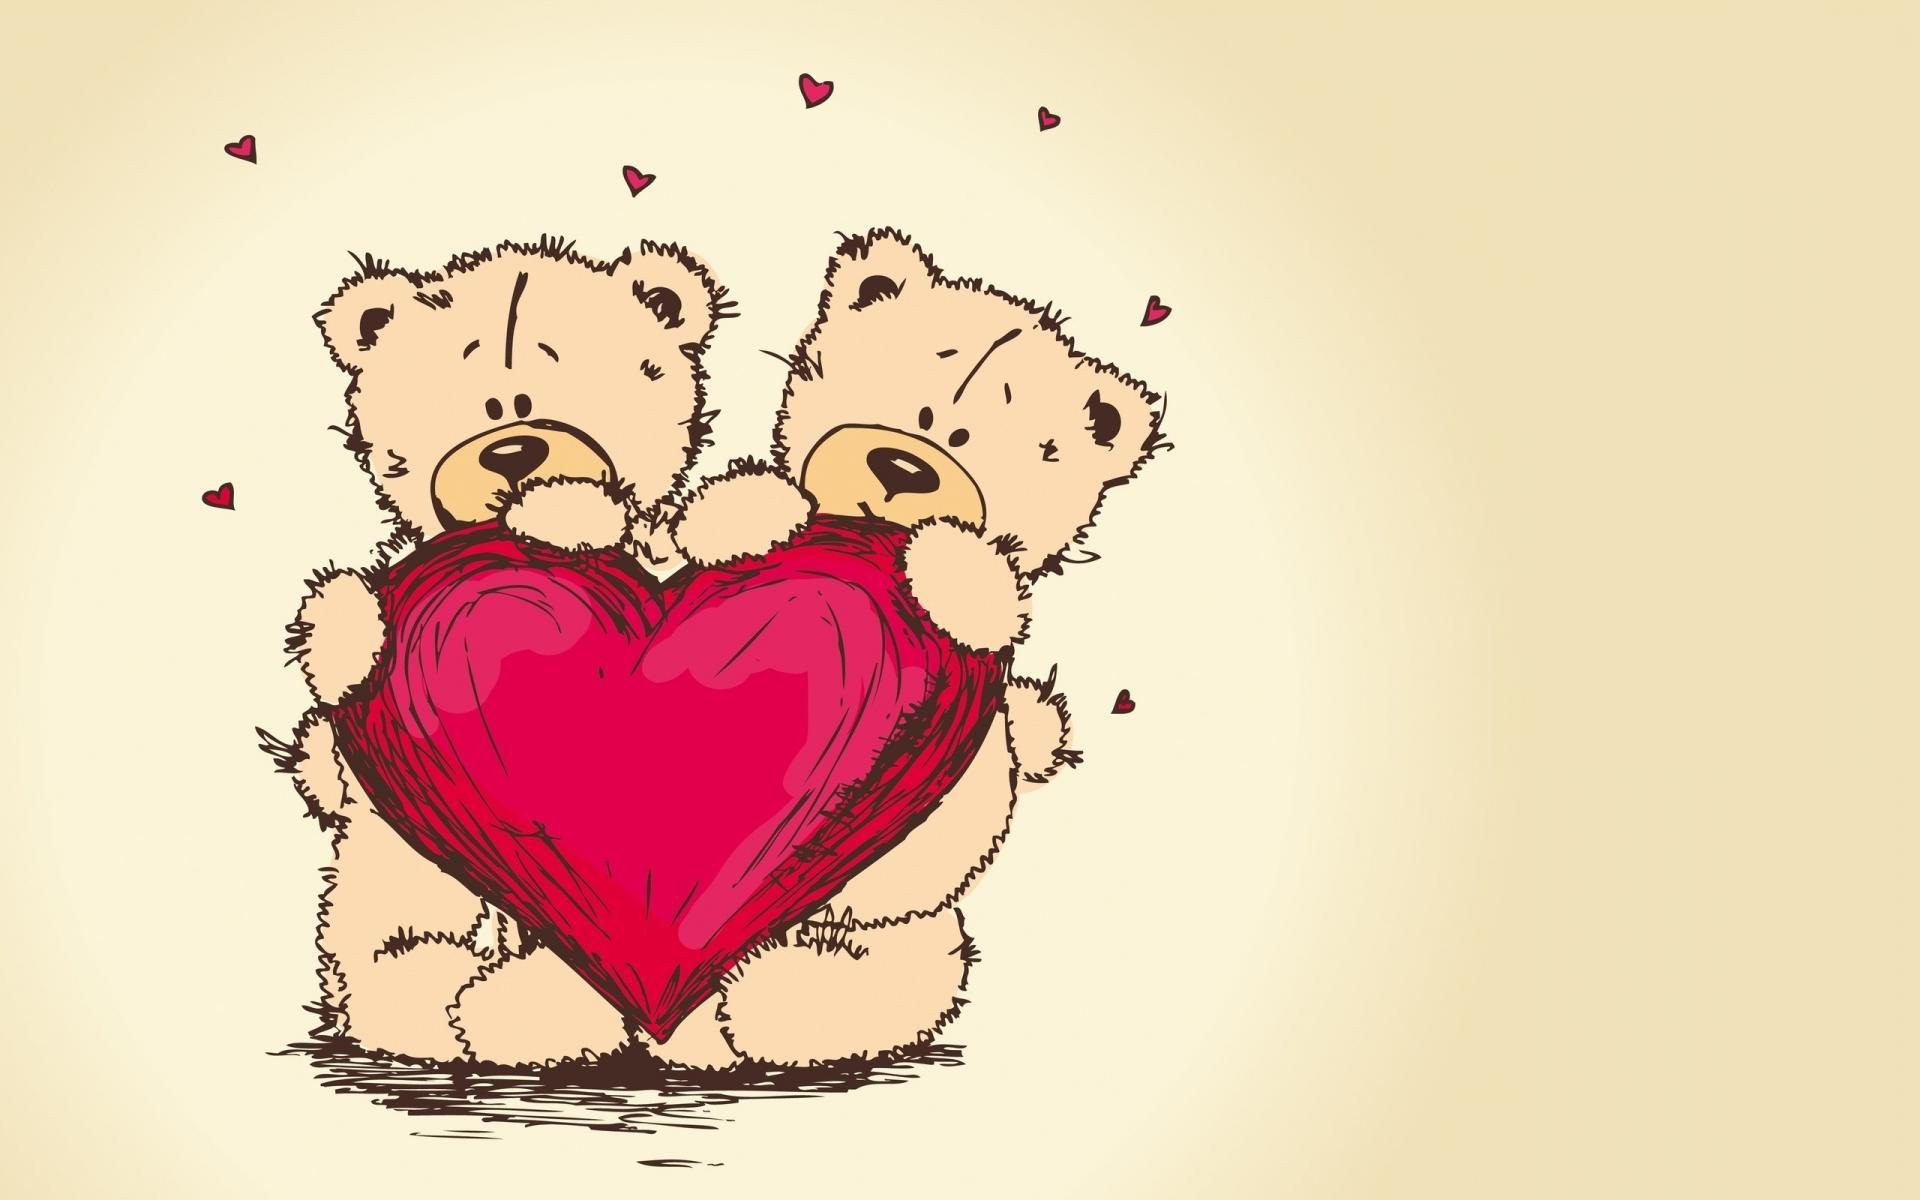 Cute Teddy Bears Wallpapers Hd Teddy Bear Love Wallpapers Hd Desktop And Mobile Backgrounds